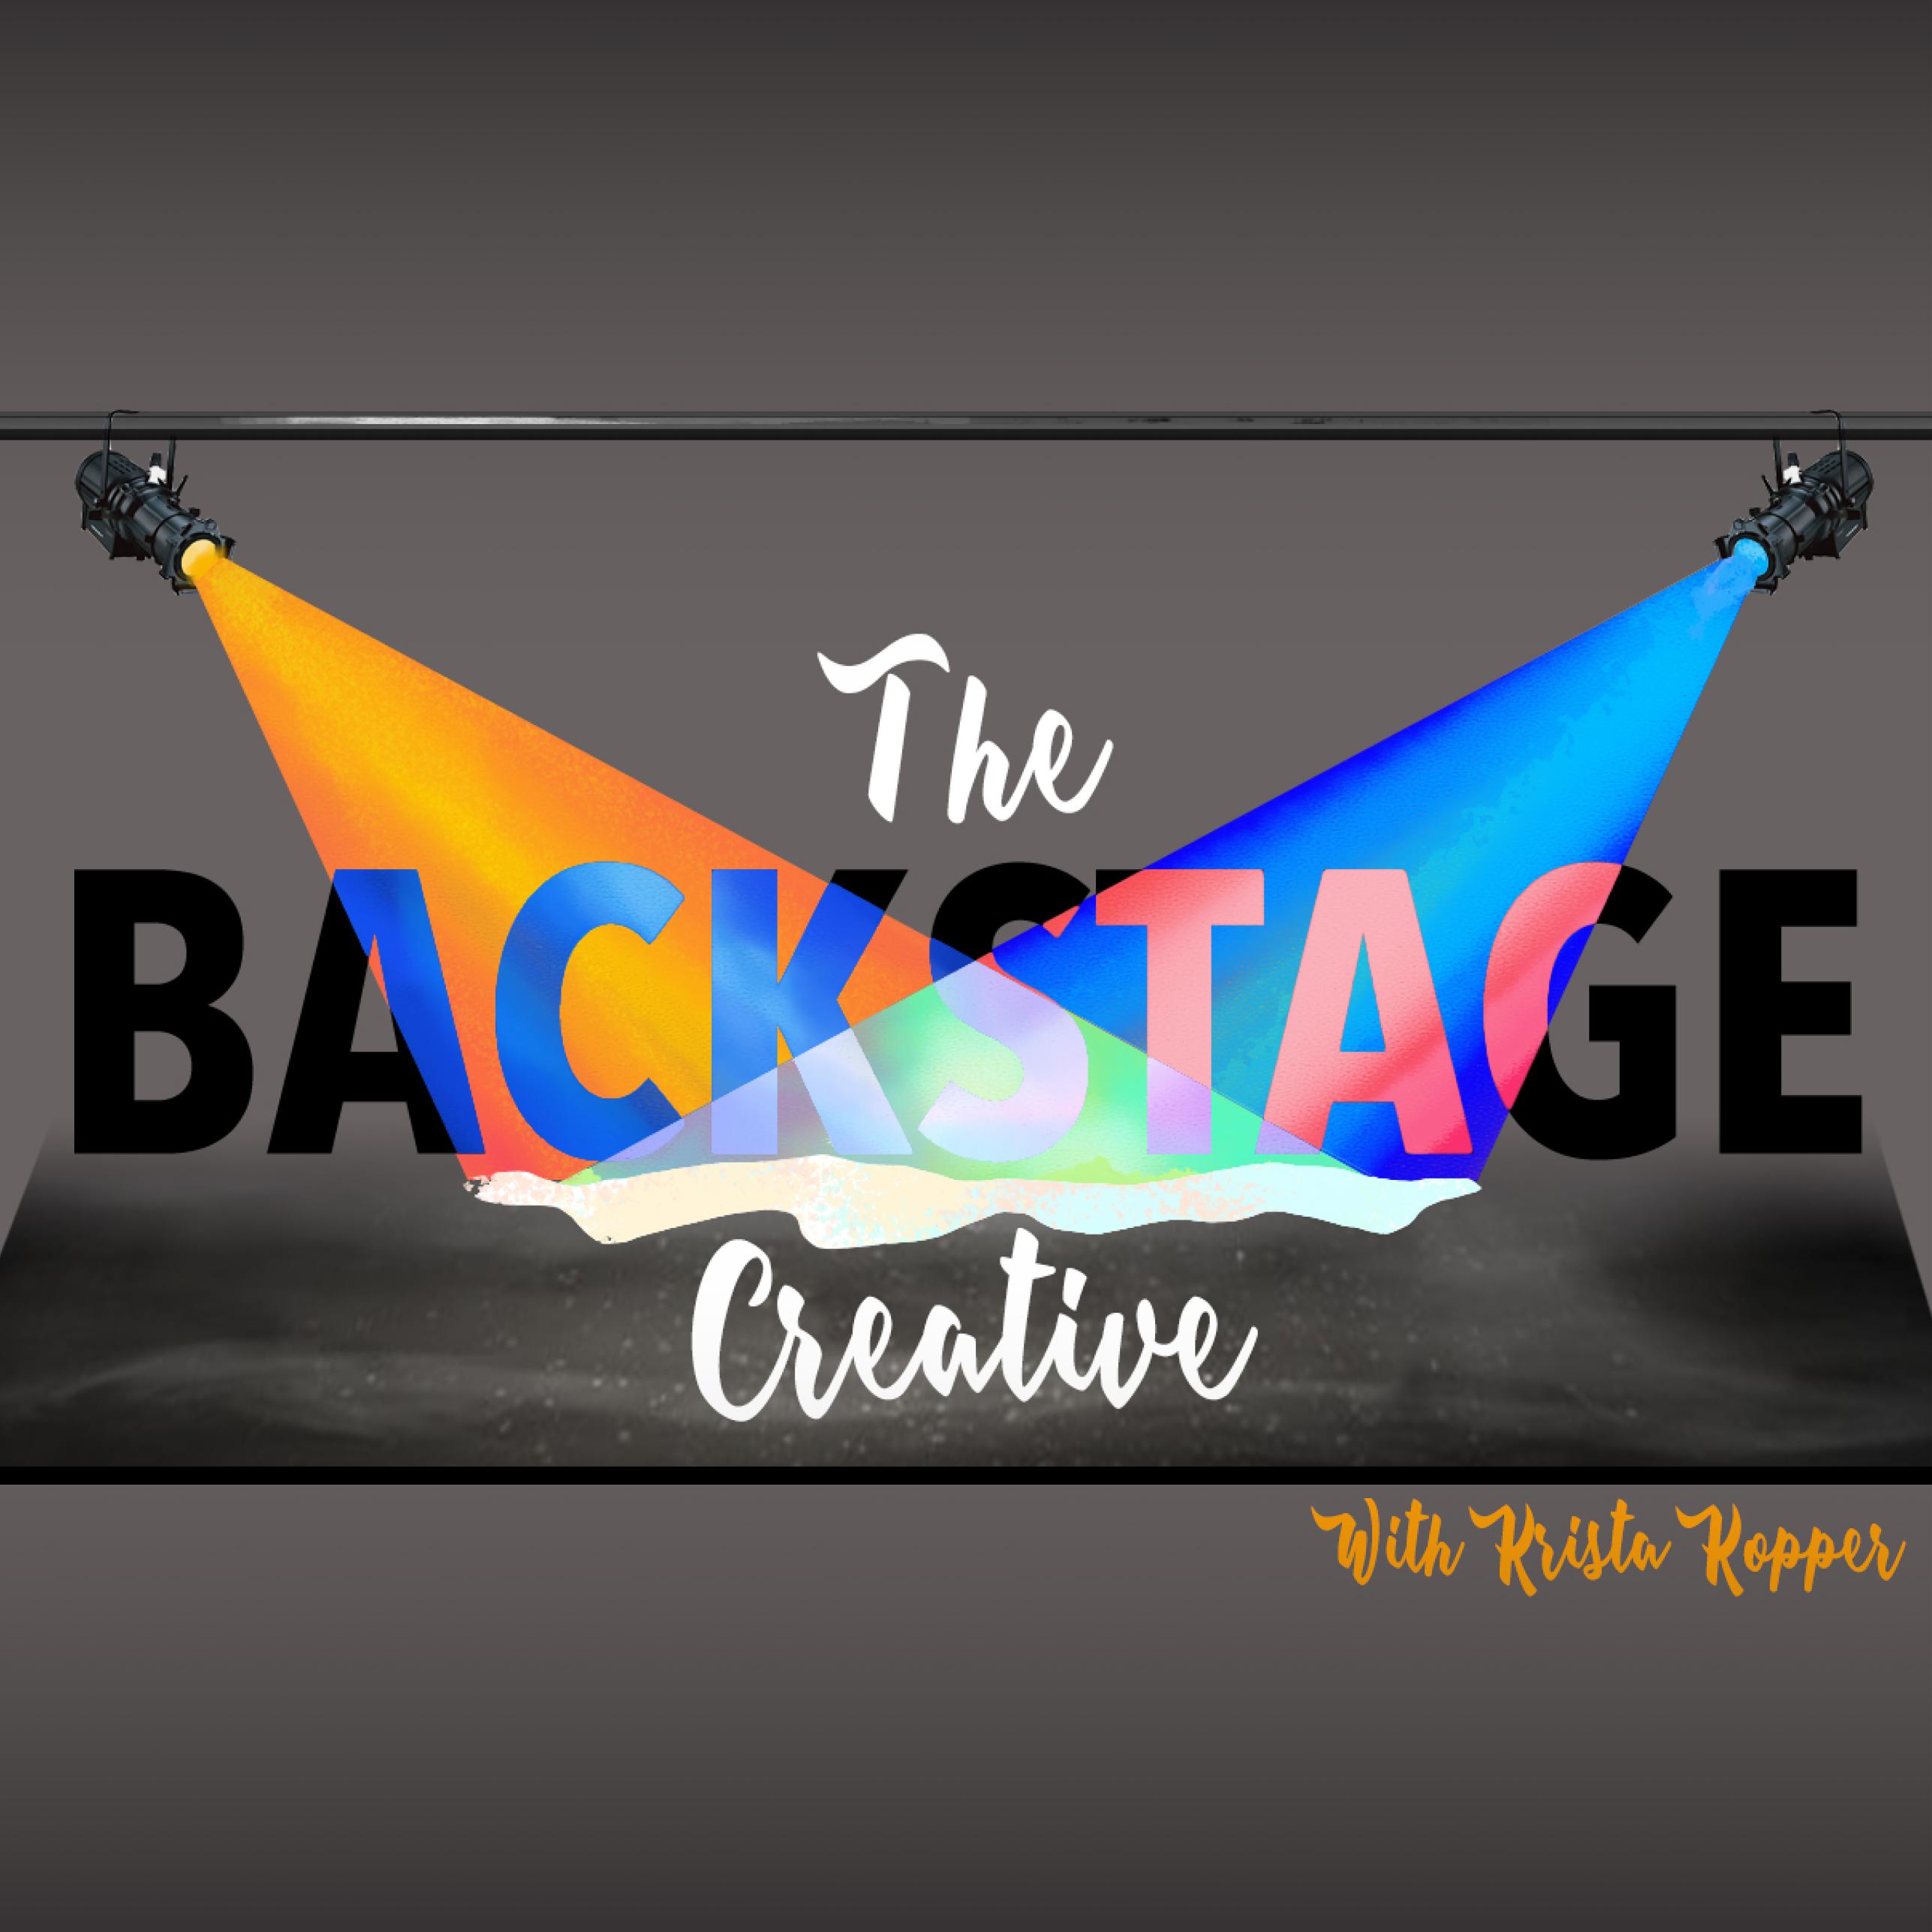 The Backstage Creative show art